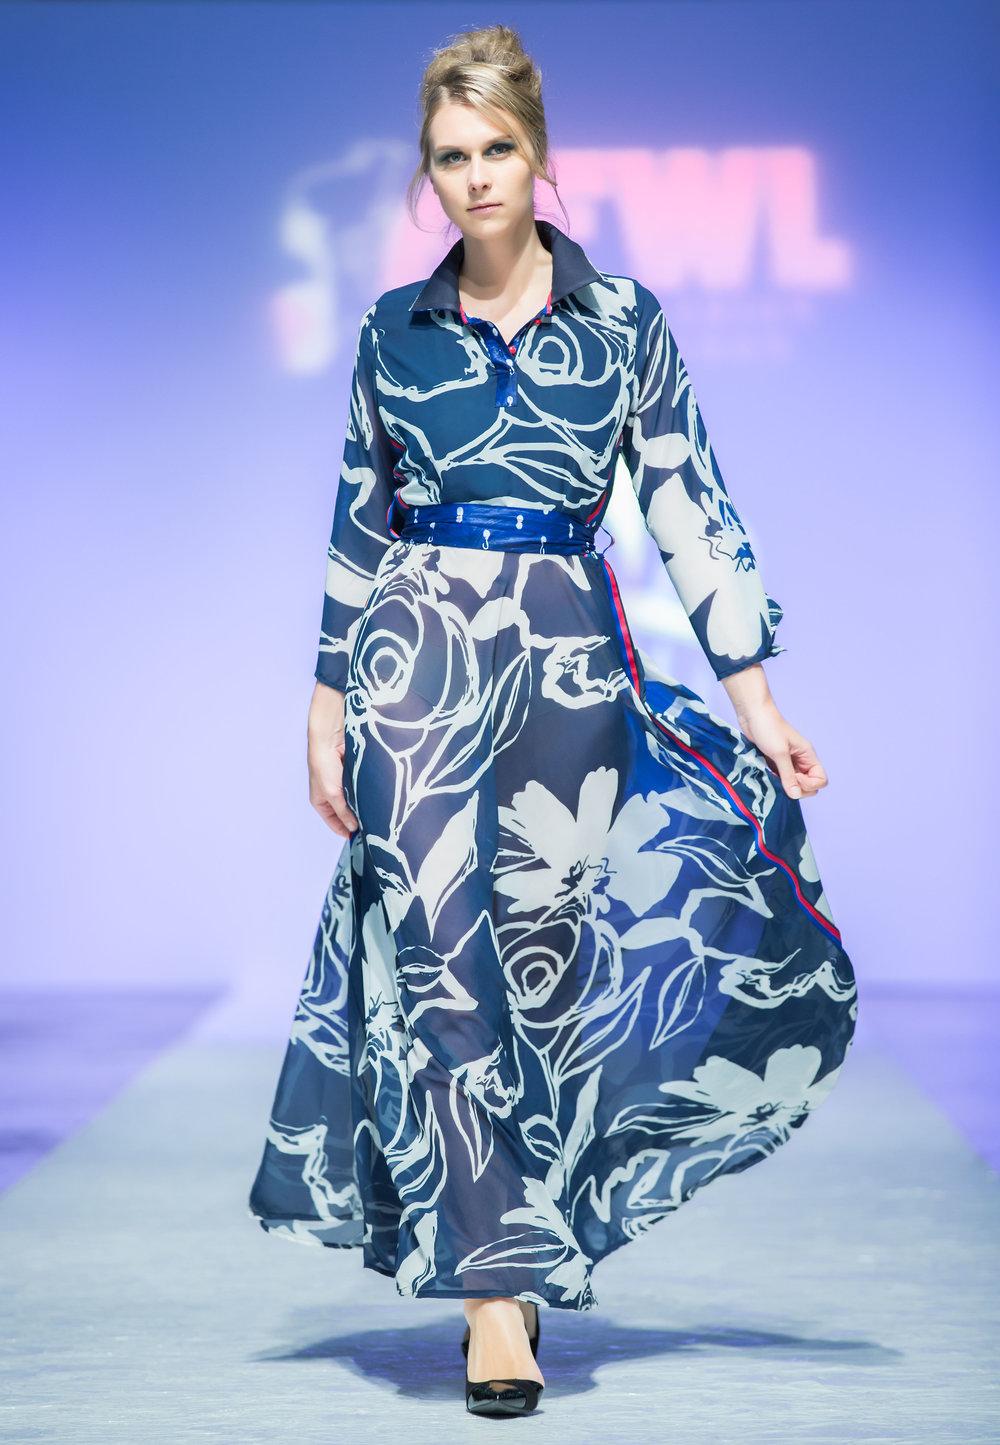 Victoria Grace-Joanna Mitroi Photography 0146.jpg